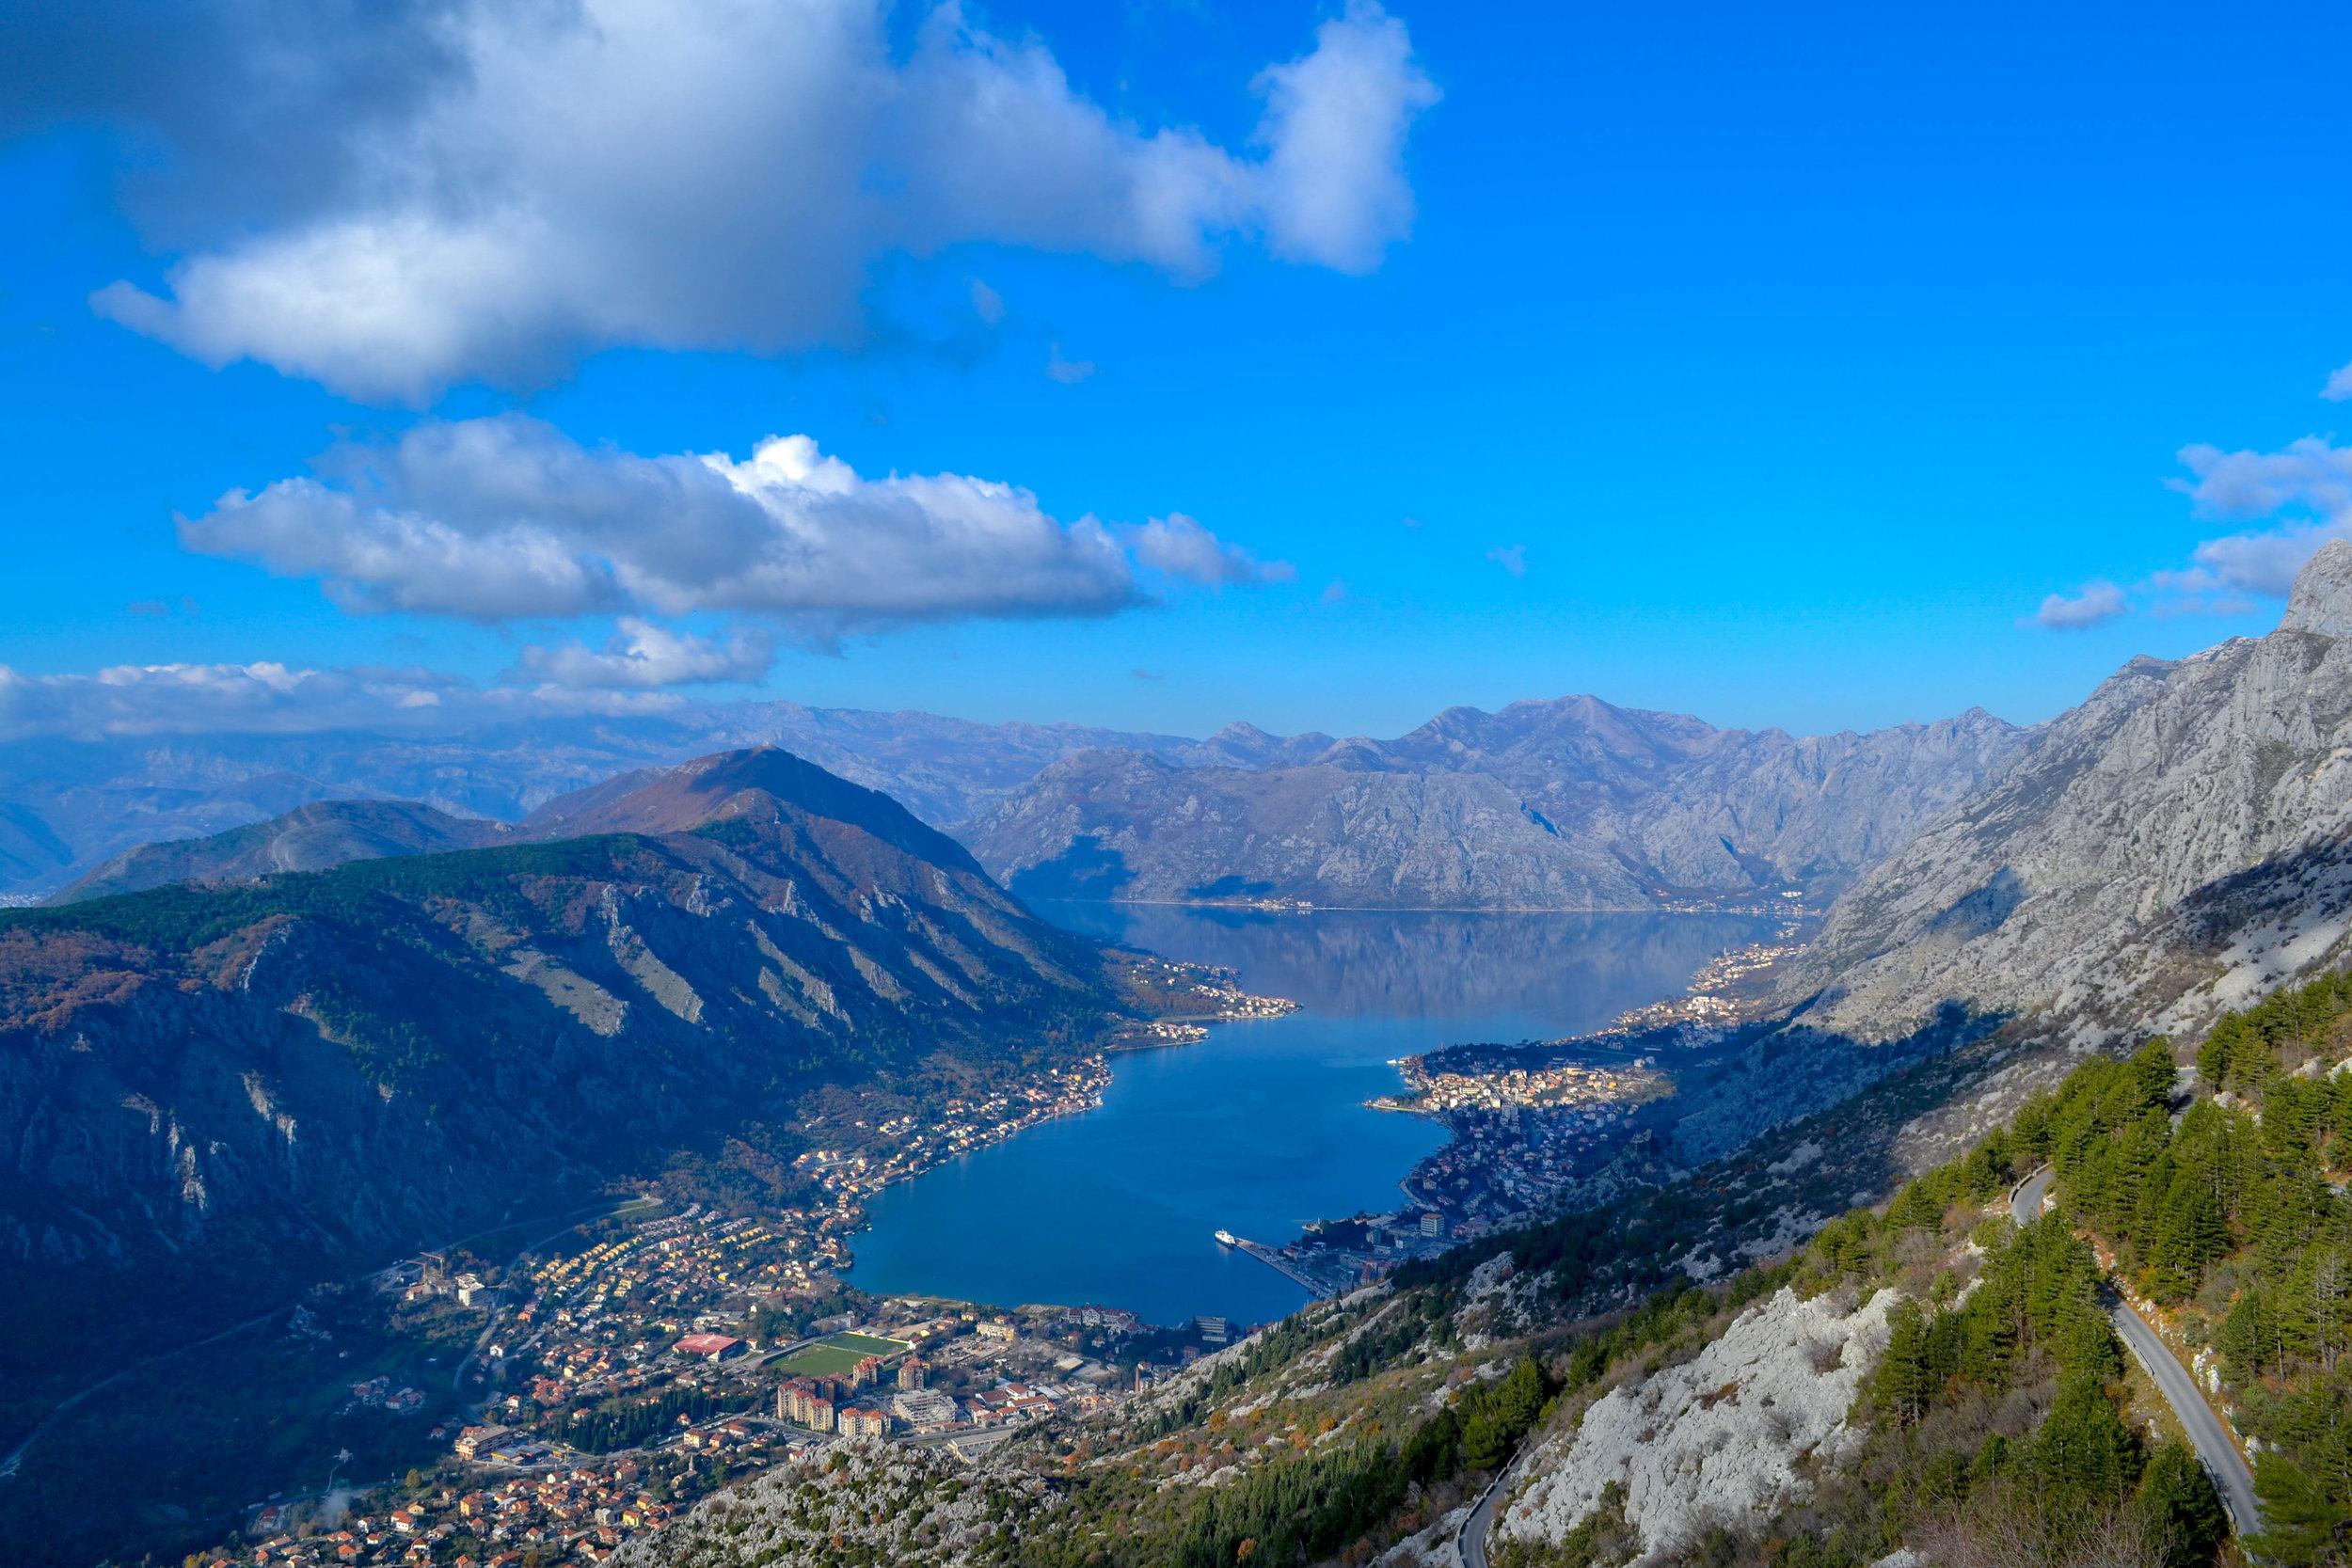 The Bay of Kotor in Montenegro